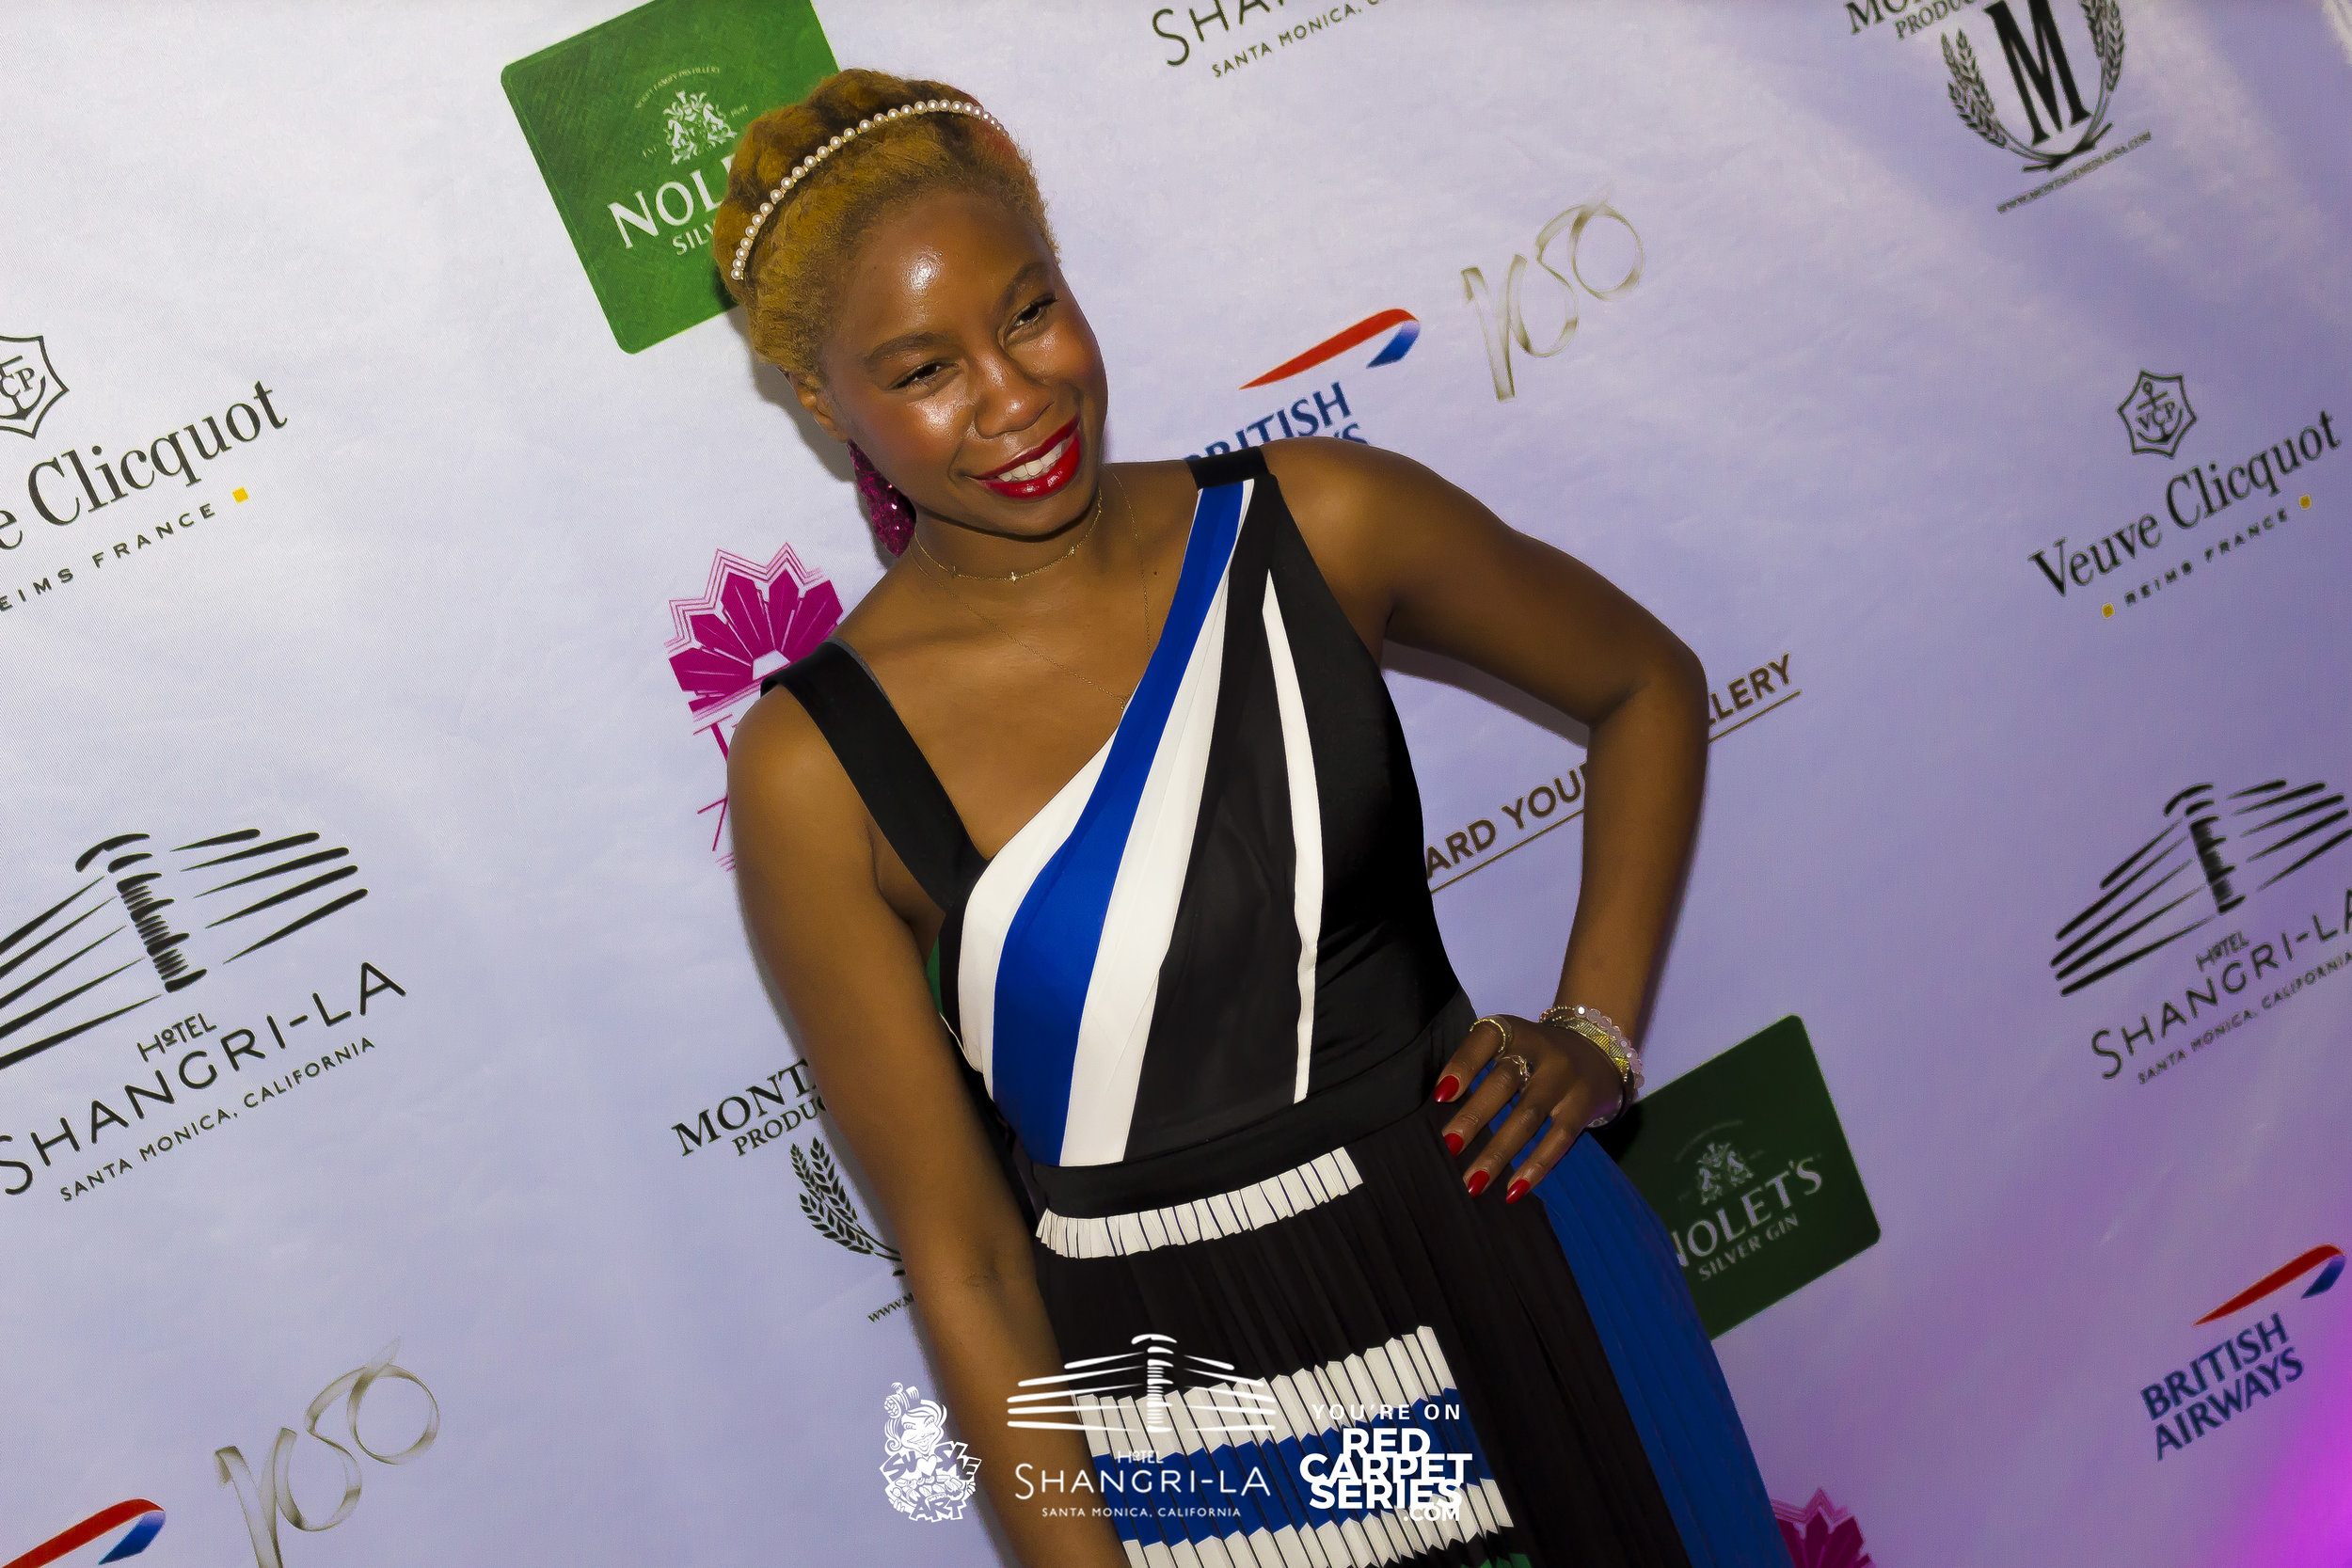 Shangri-la Diamond Jubilee - 03-11-19 - vol 2_48.jpg